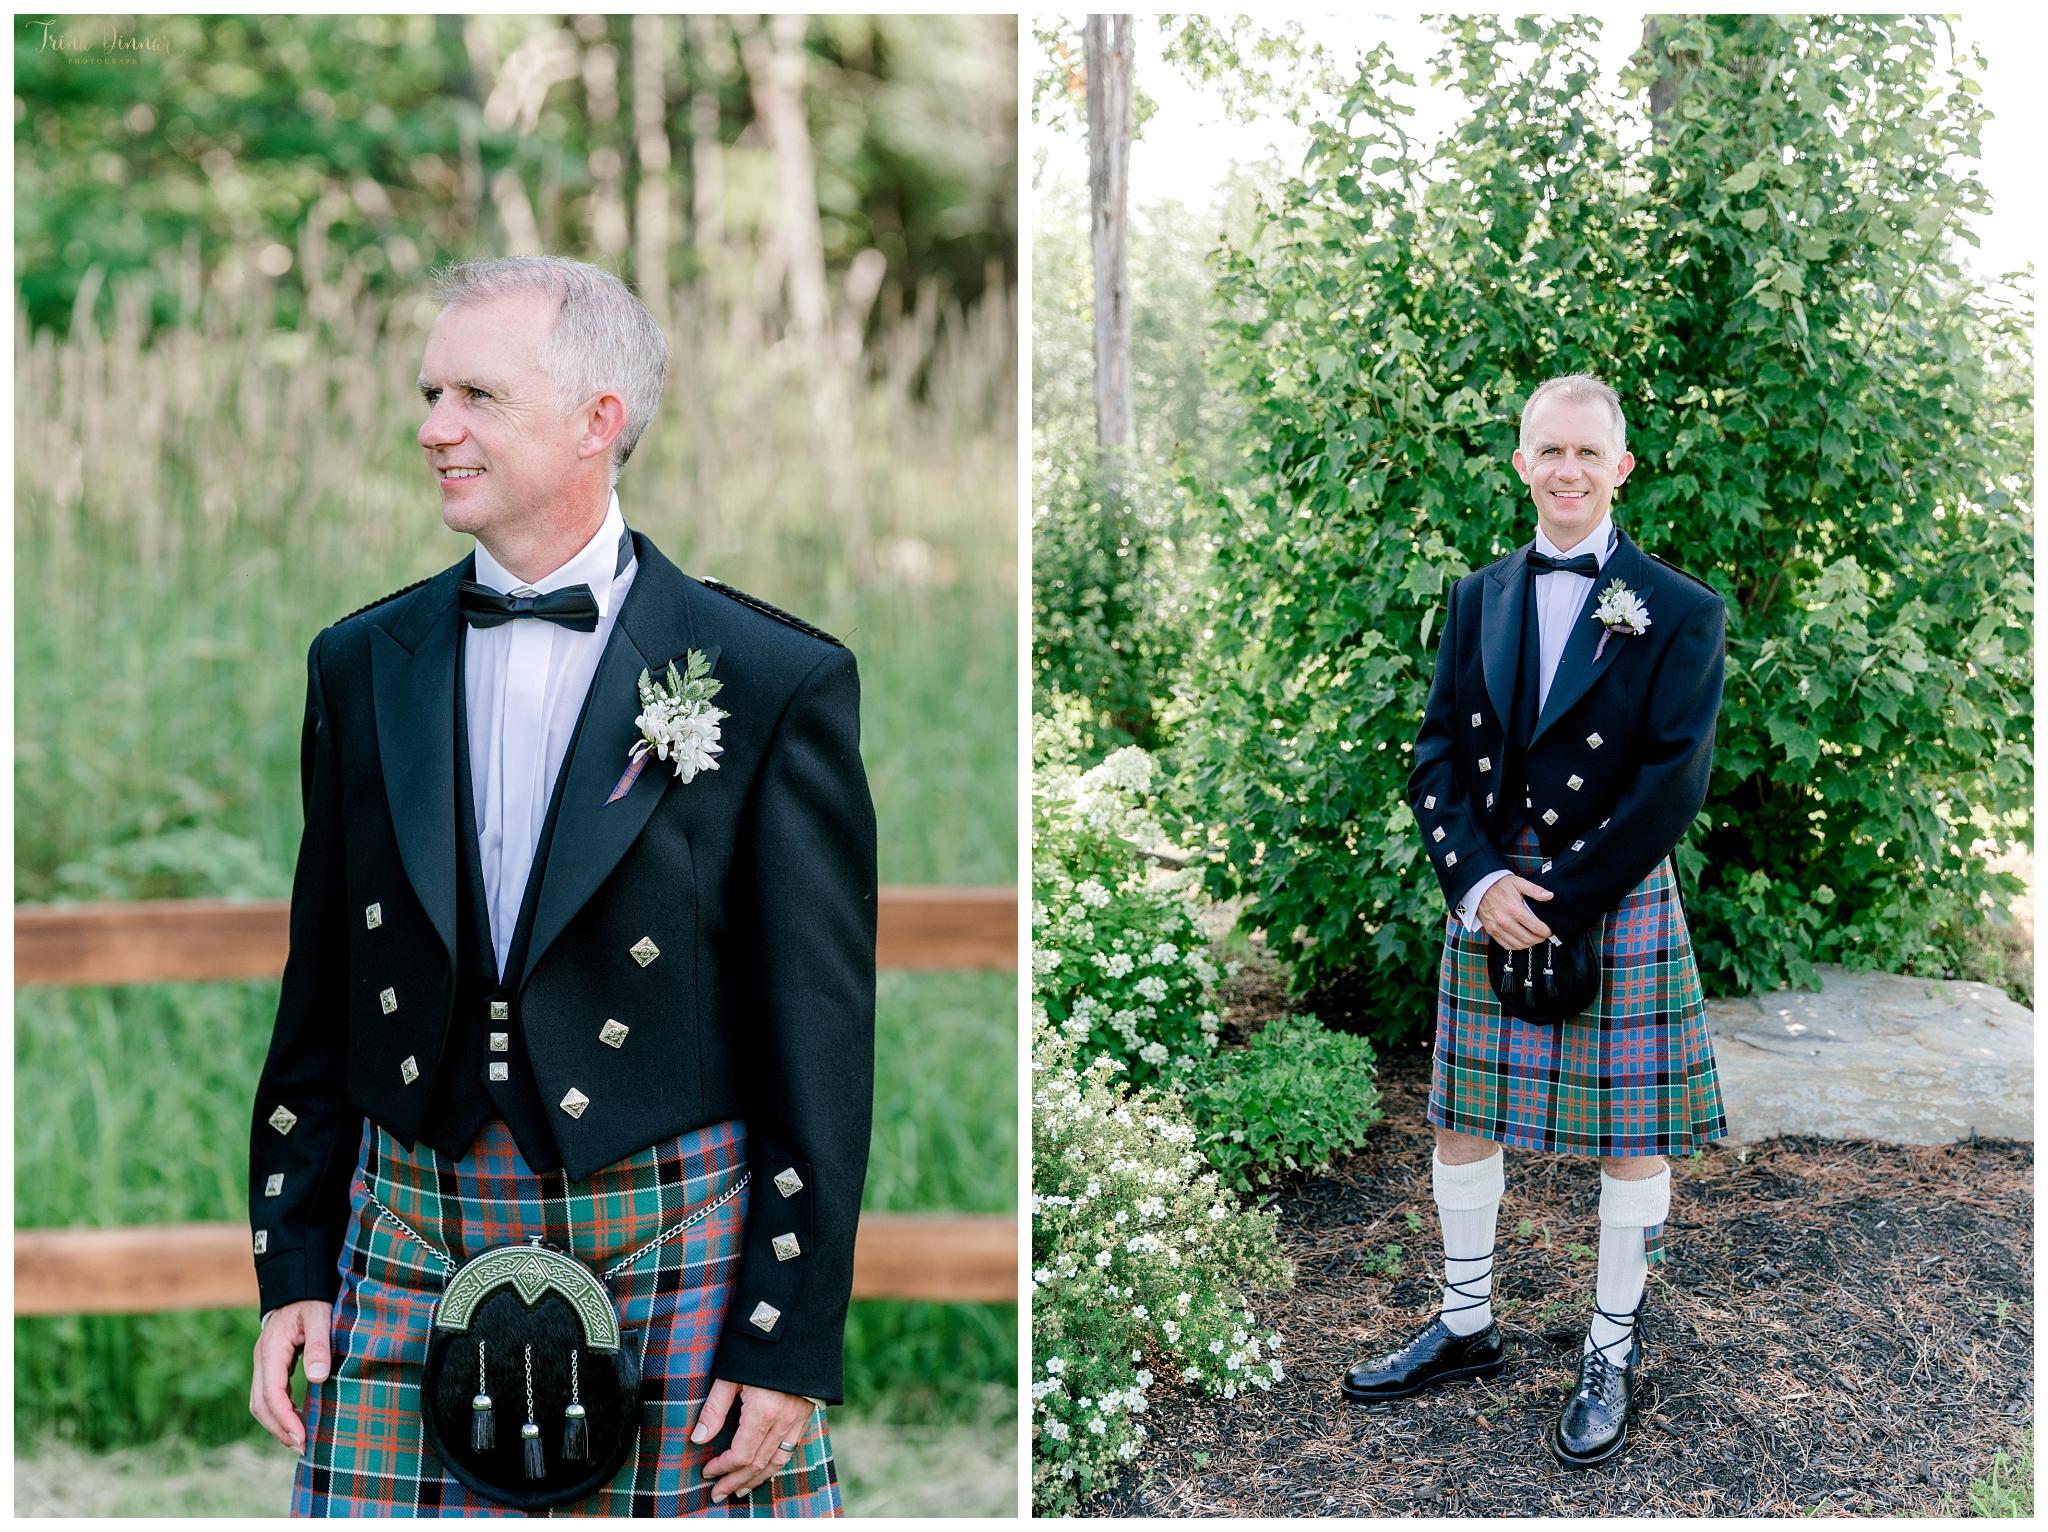 Scottish Groom Wedding Portraits in Maine